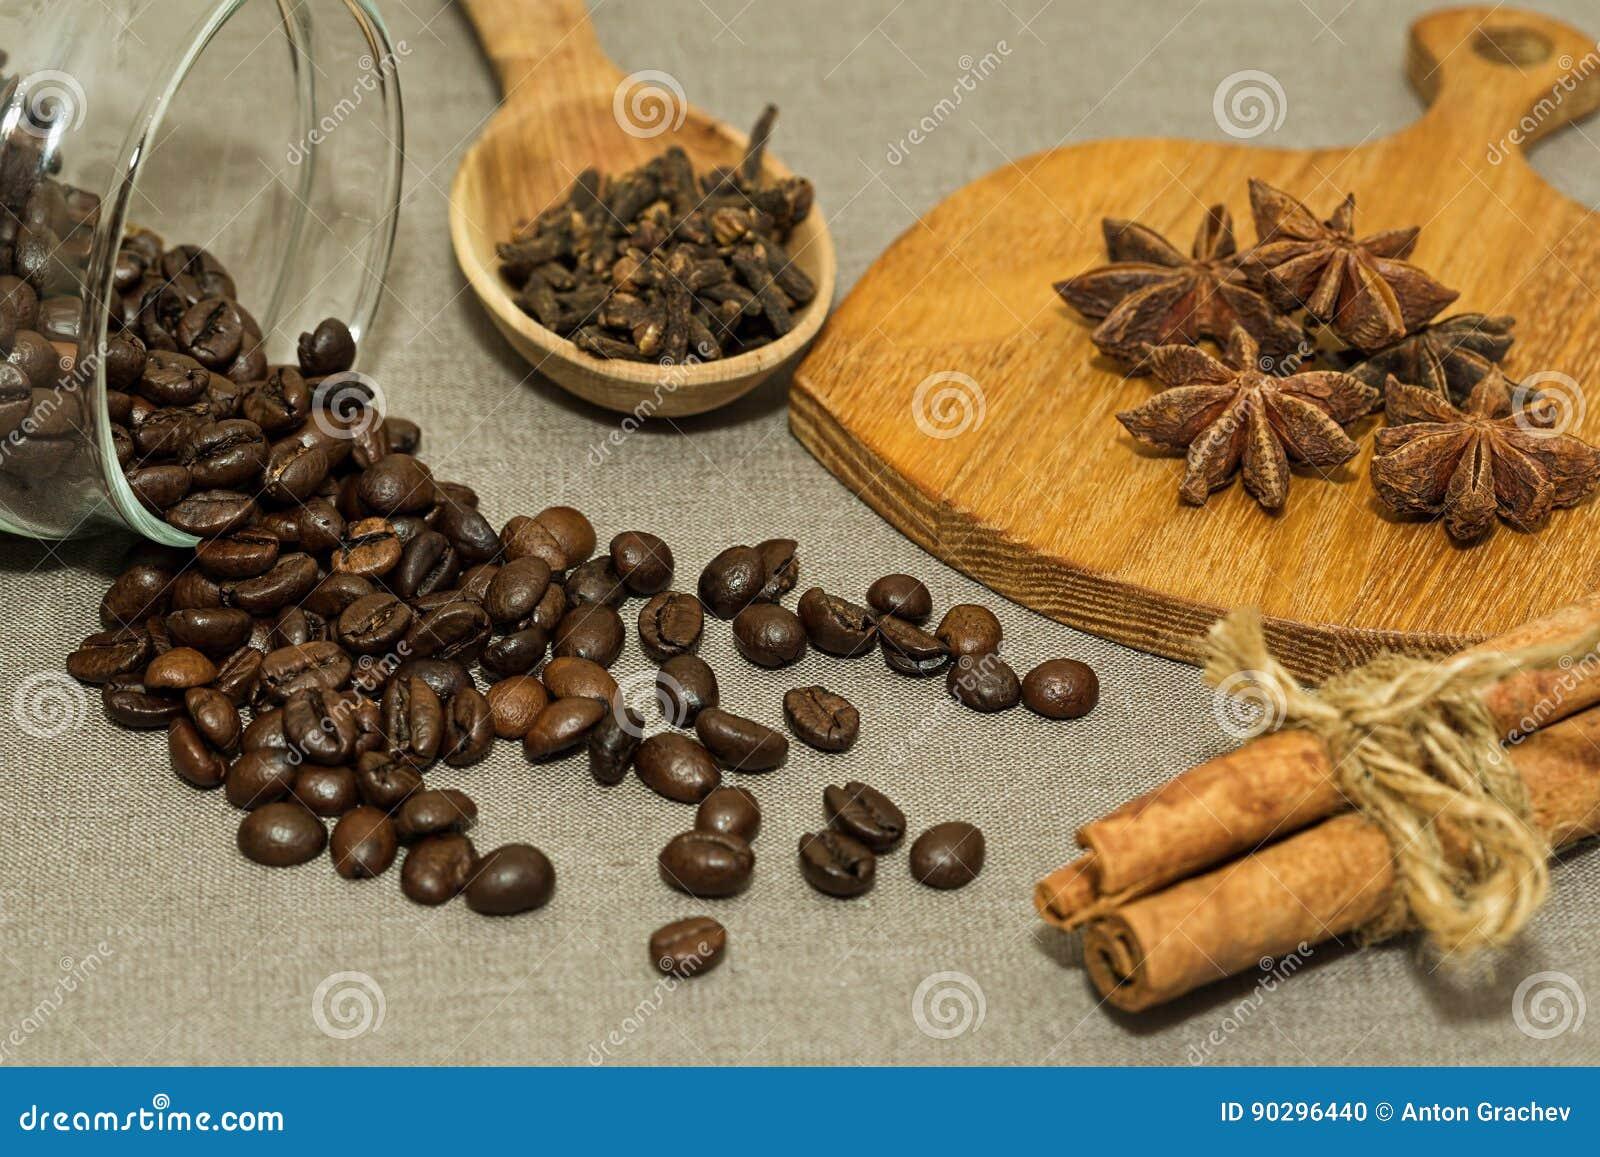 Chicchi di caffè arrostiti e spezie differenti